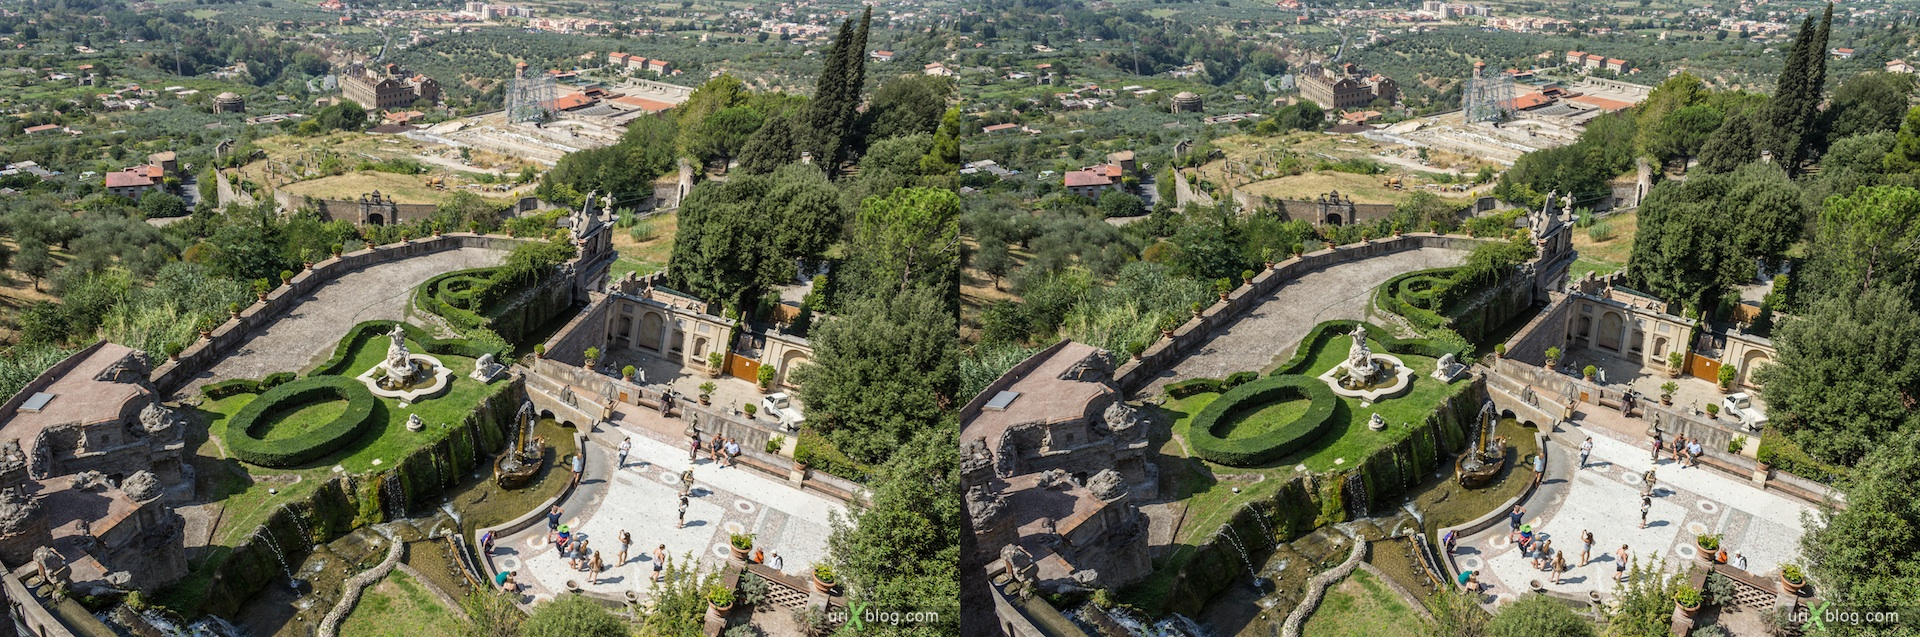 2012, Fountain of Rometta, villa D'Este, Italy, Tivoli, Rome, 3D, stereo pair, cross-eyed, crossview, cross view stereo pair